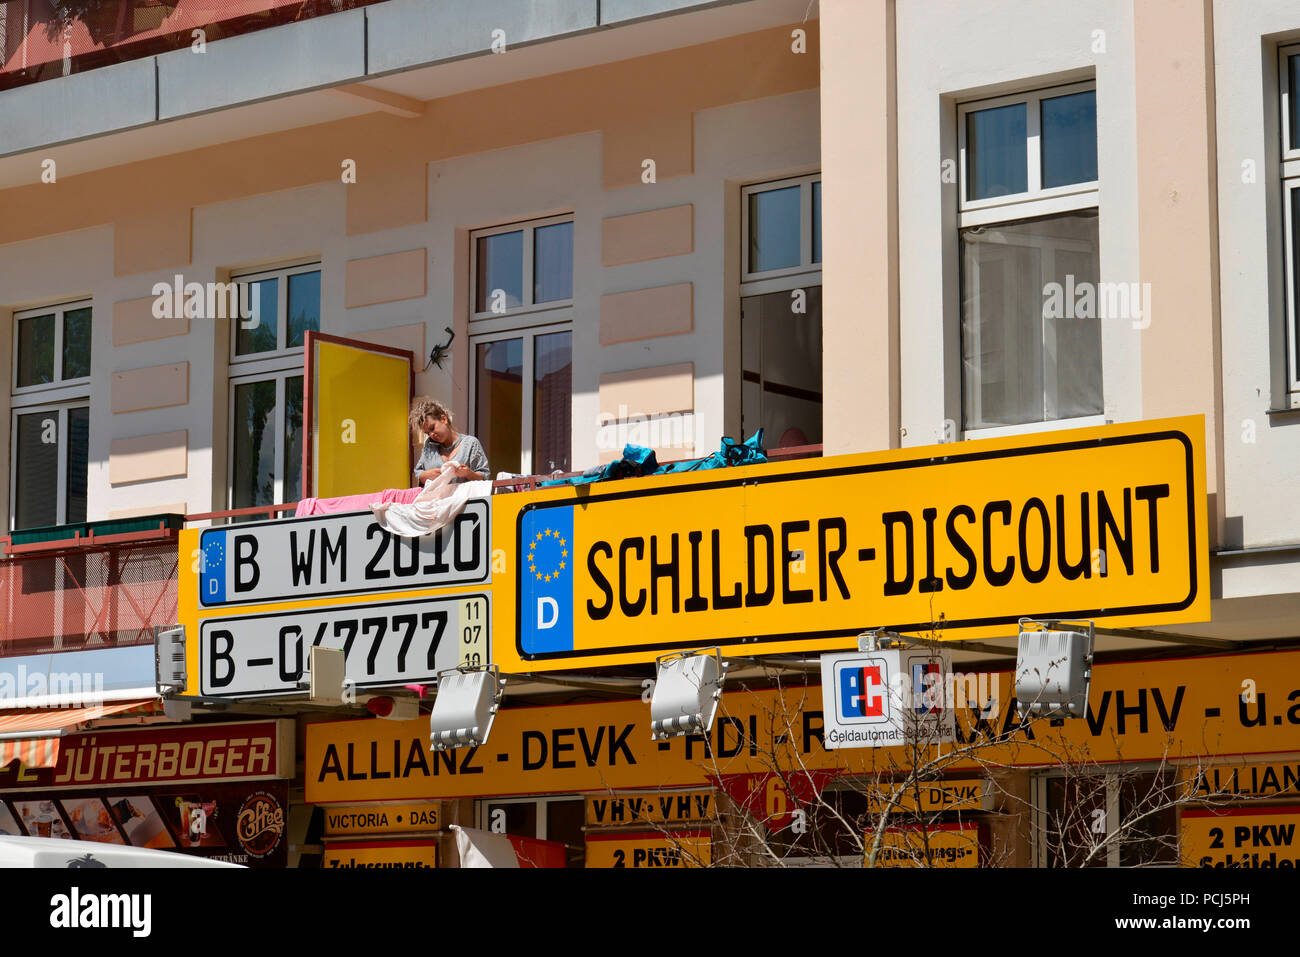 KFZ-Schilder, Jueterboger Strasse, Kreuzberg, Berlin, Deutschland, J³terboger Strasse - Stock Image